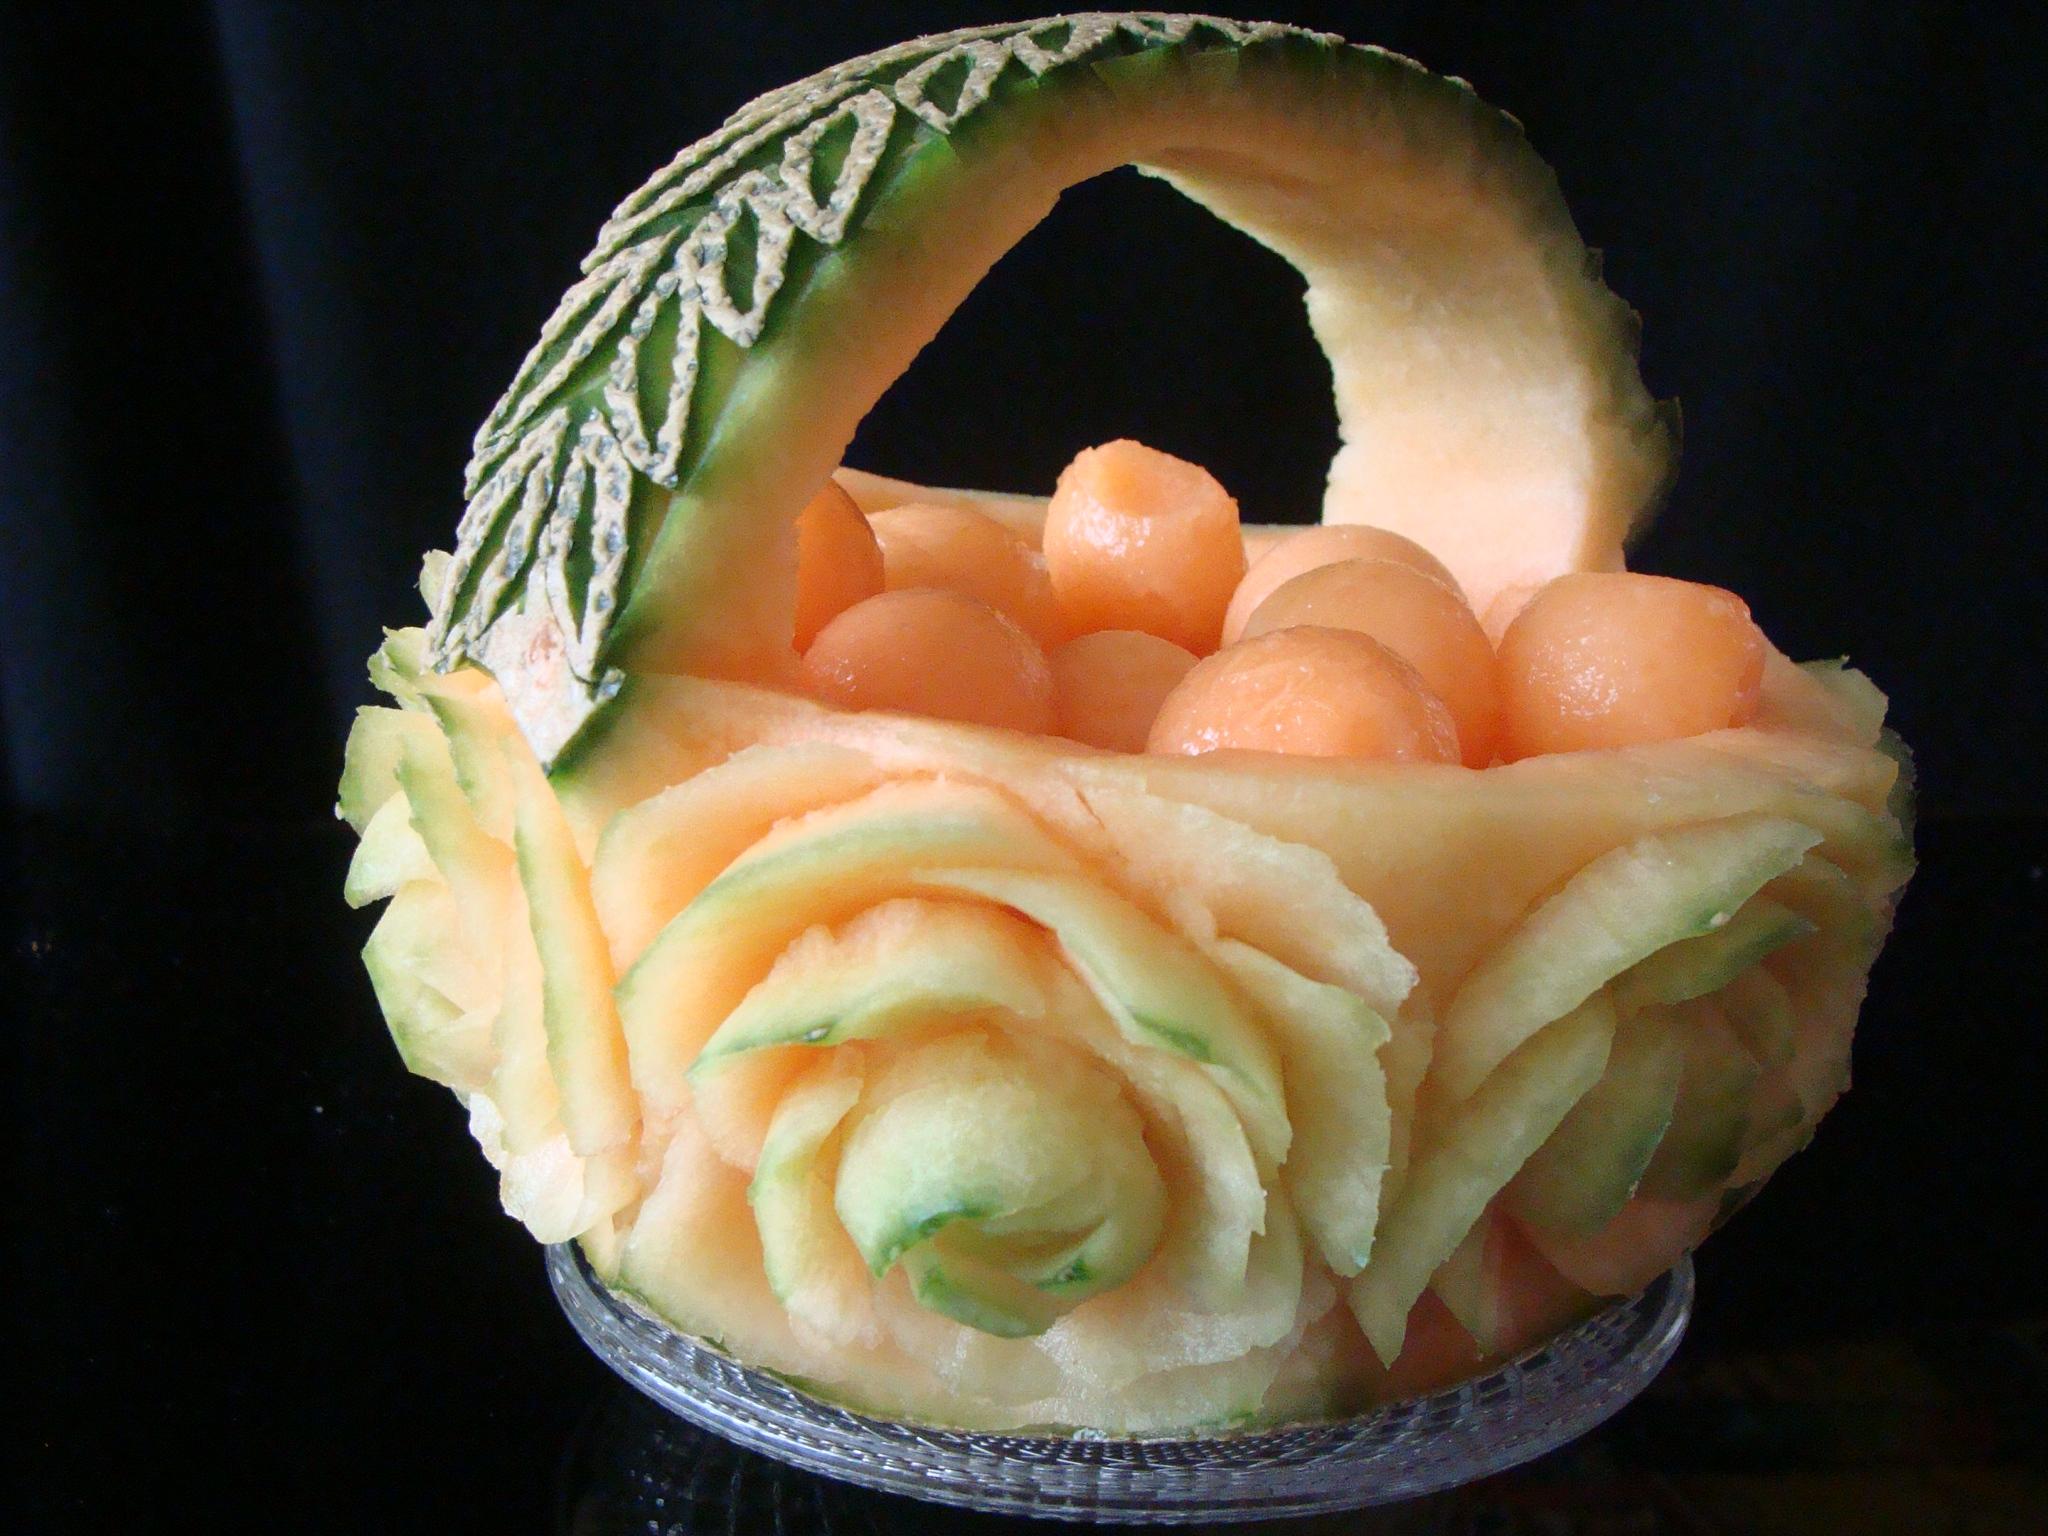 Fruitysplendour fruit carving displays scarborough